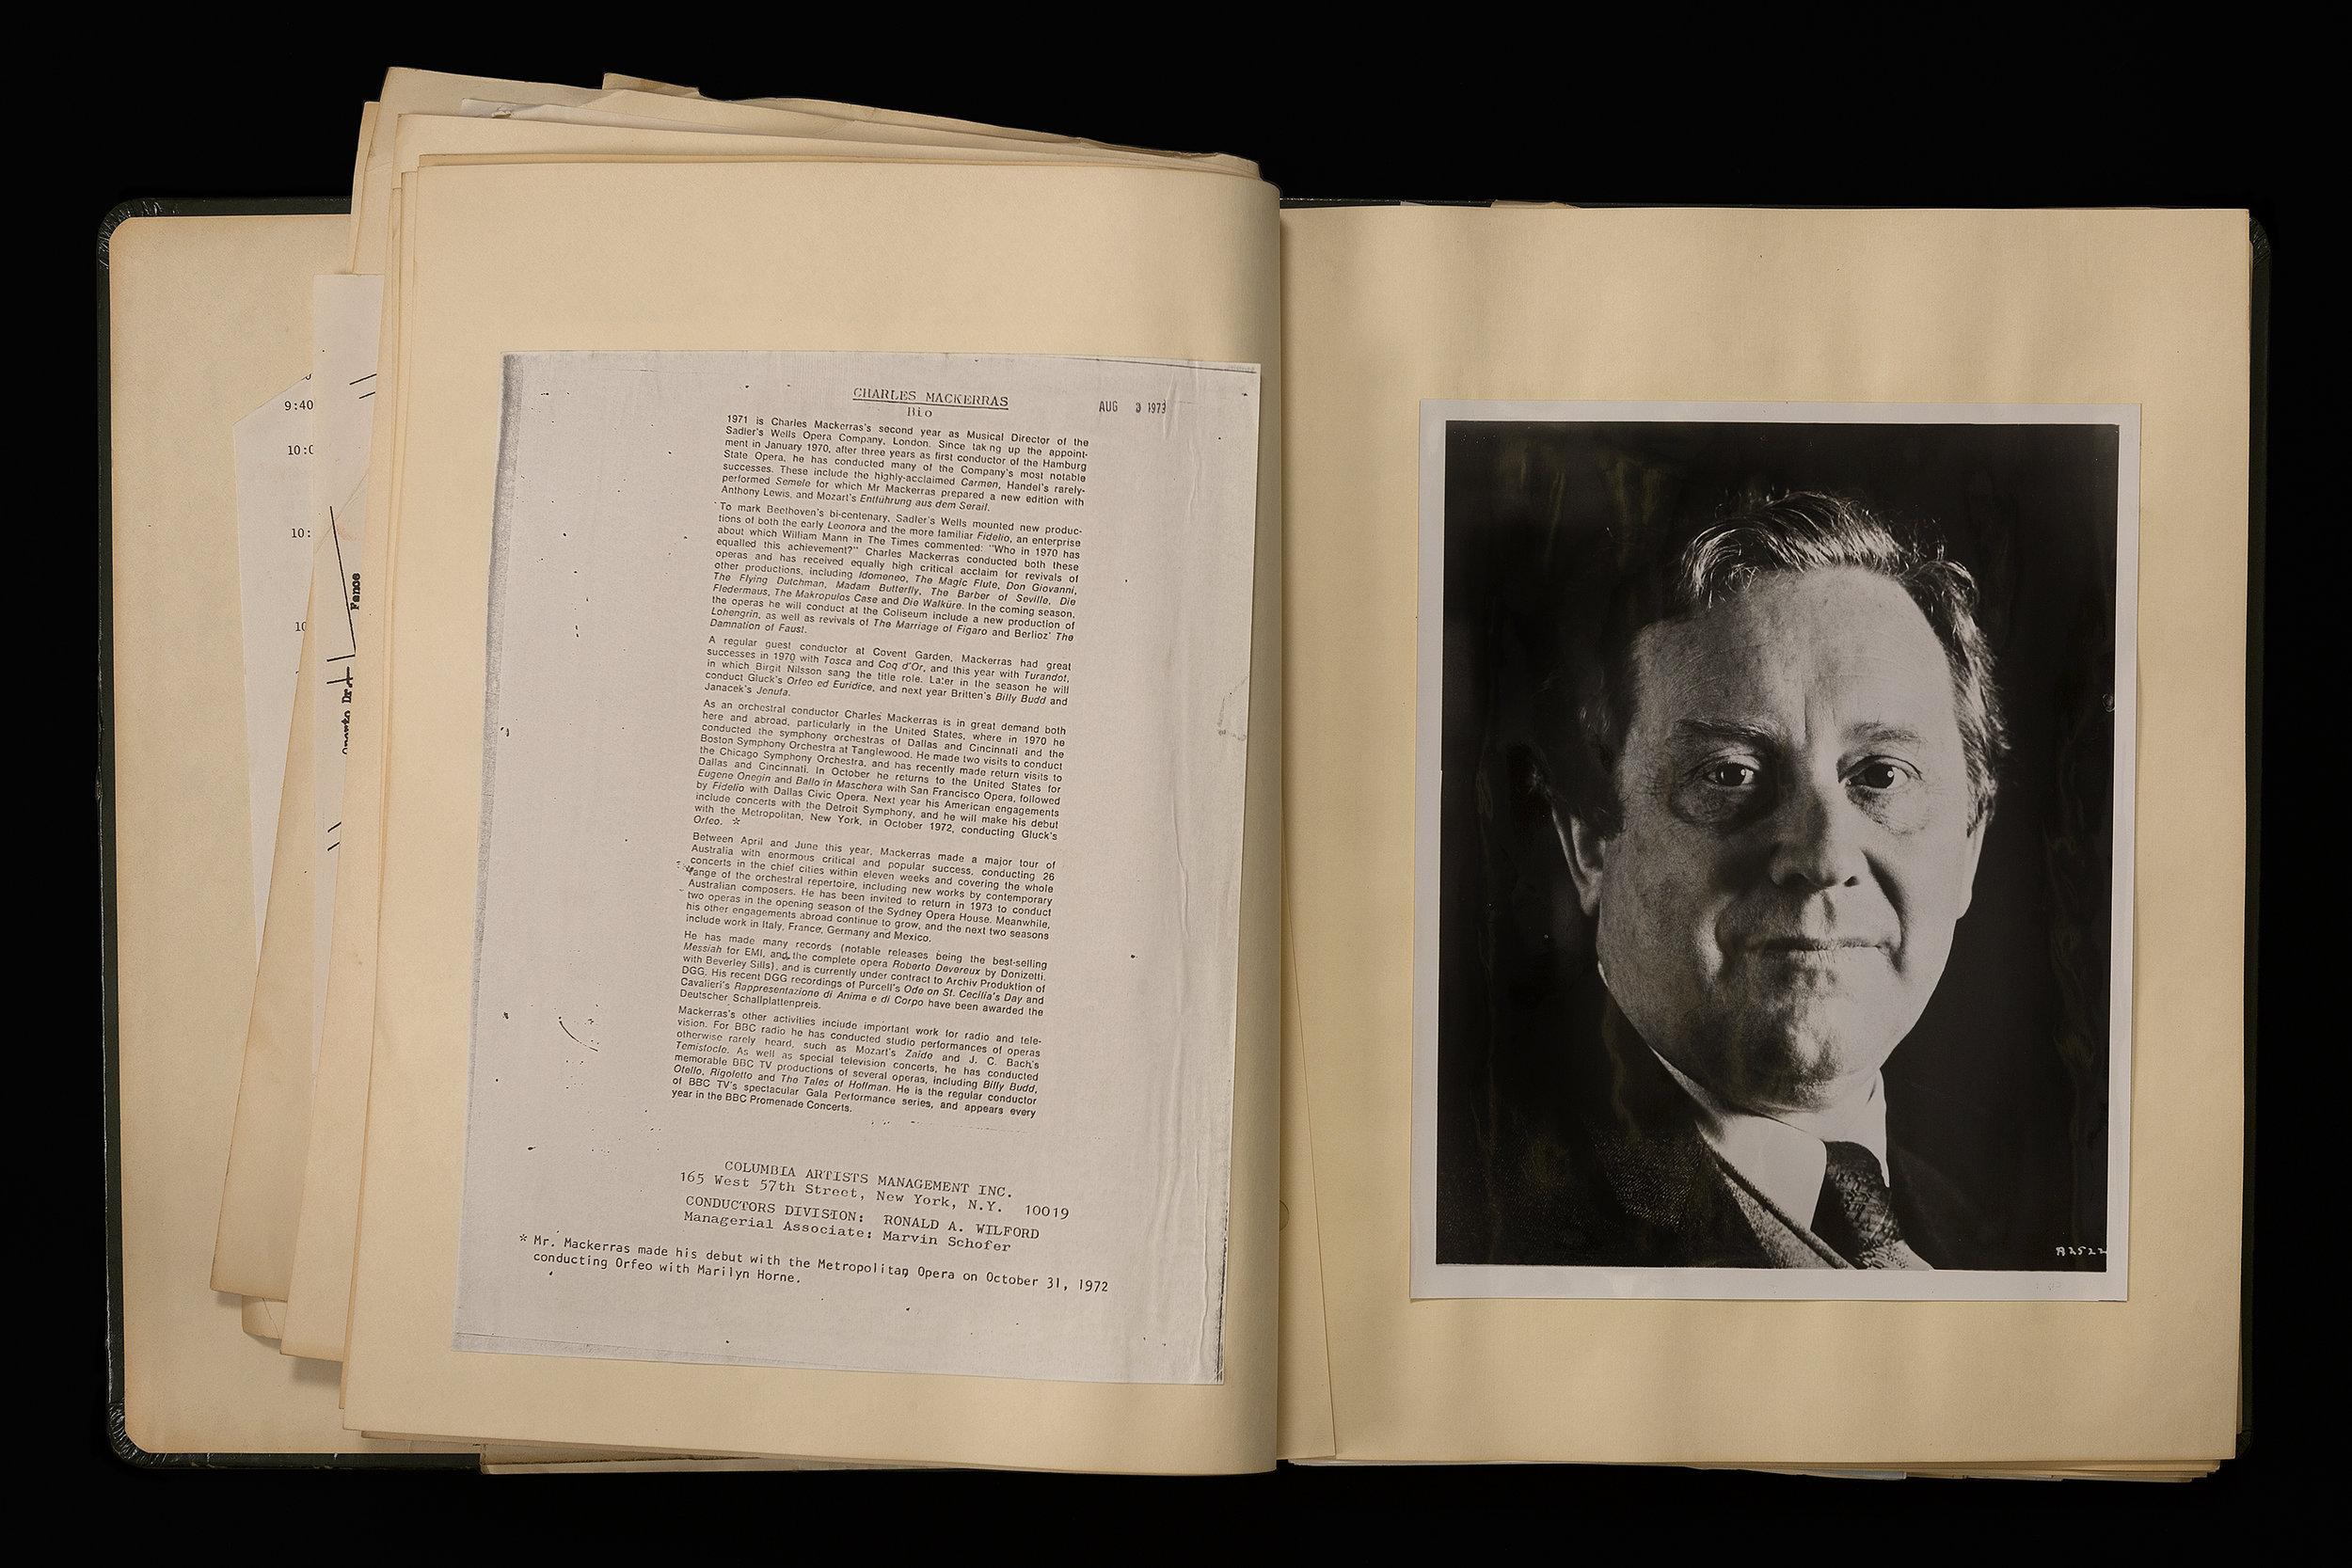 HBVolunteerScrapbook_PageF_B0763_1974.jpg